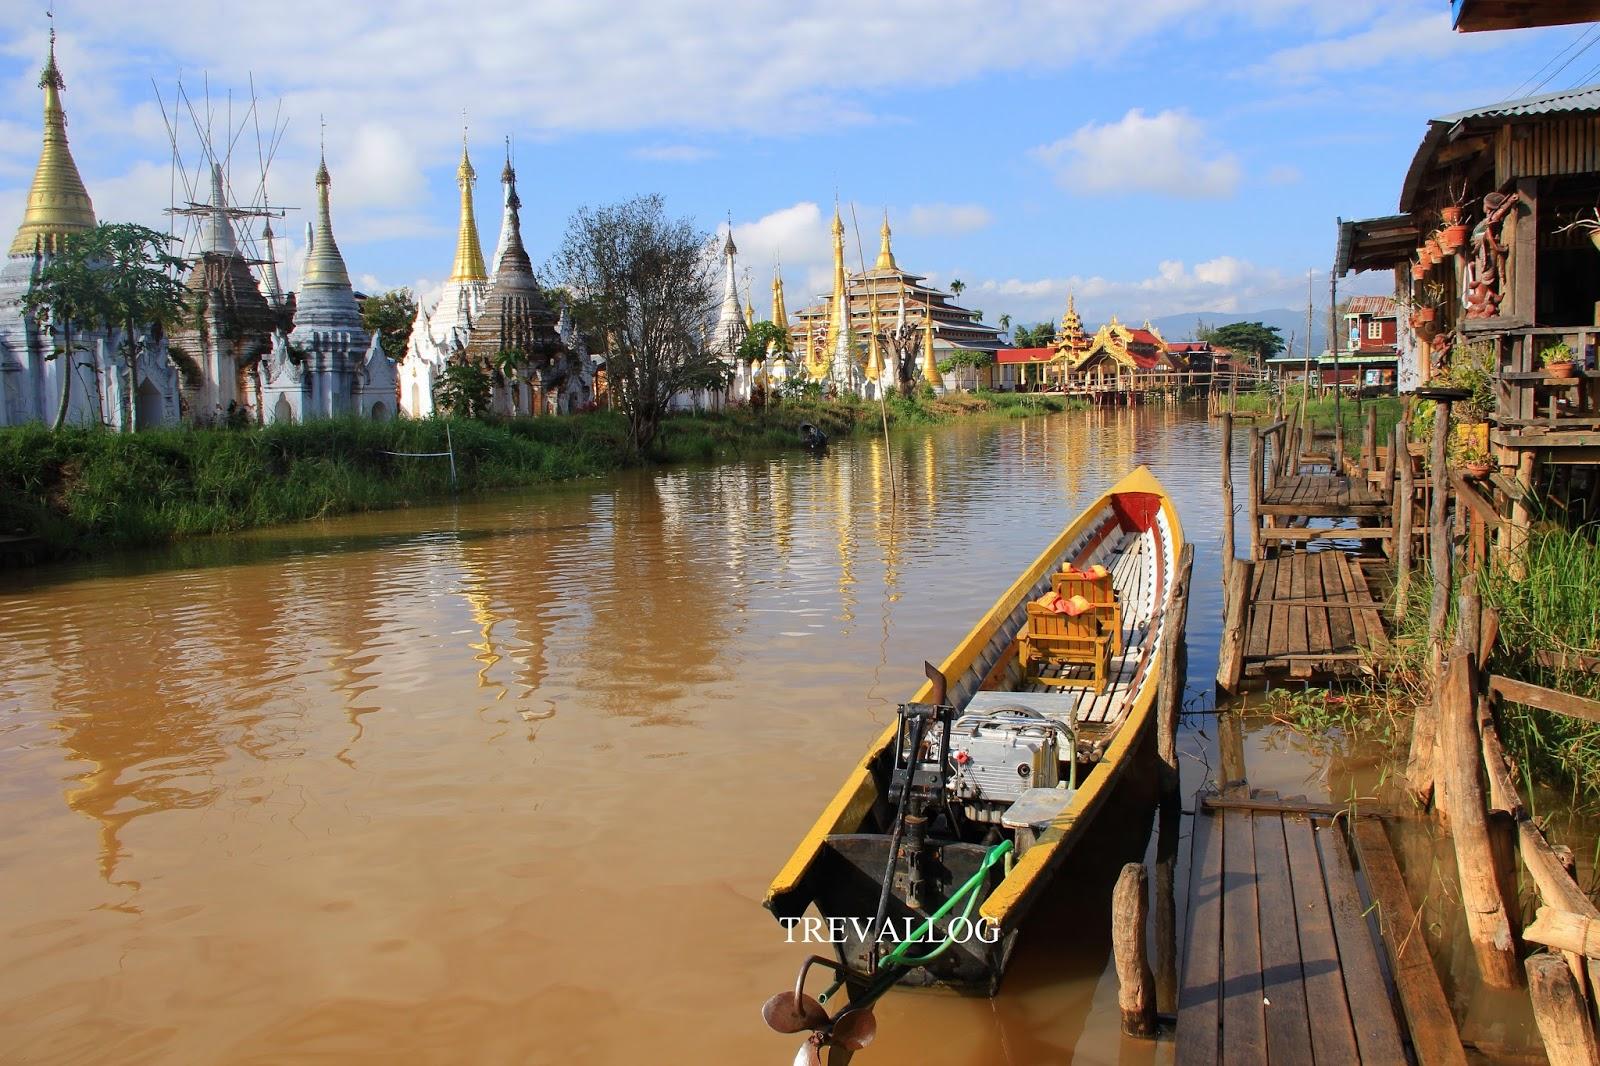 Pagoda in Inle lake, Myanmar